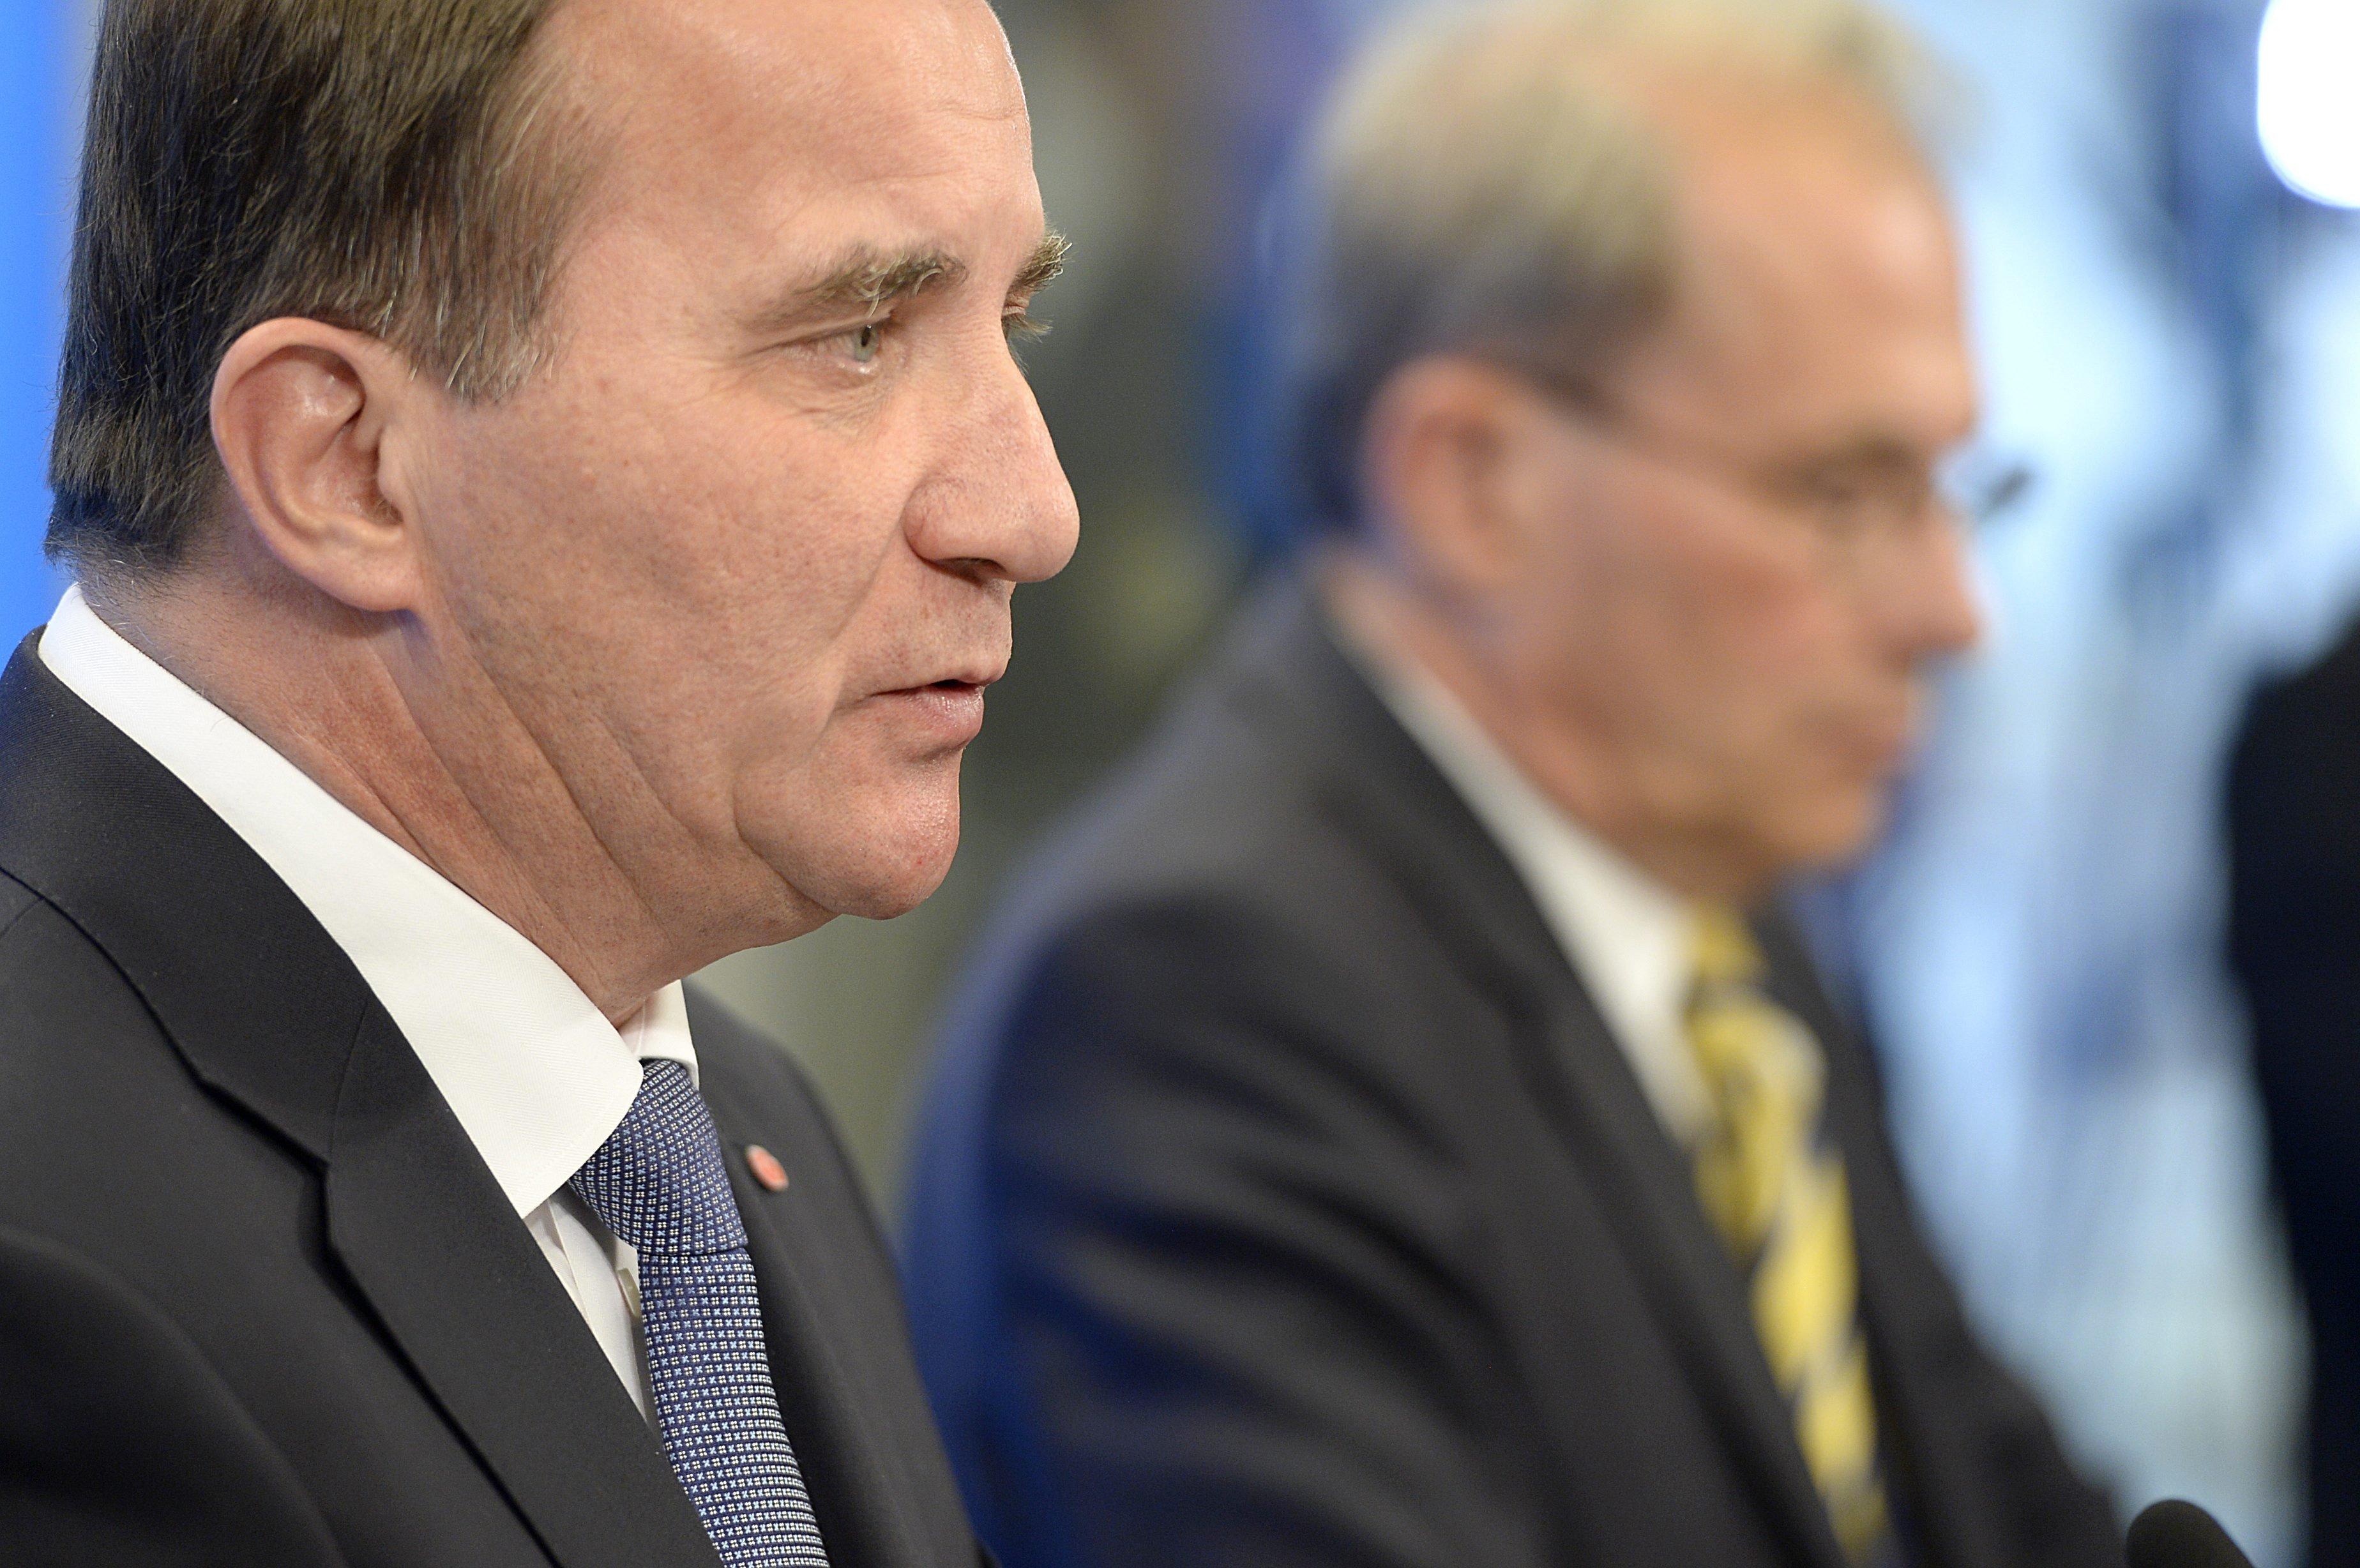 From left: Stefan Löfven and Per Westerberg in Stockholm on Sept. 18, 2014.